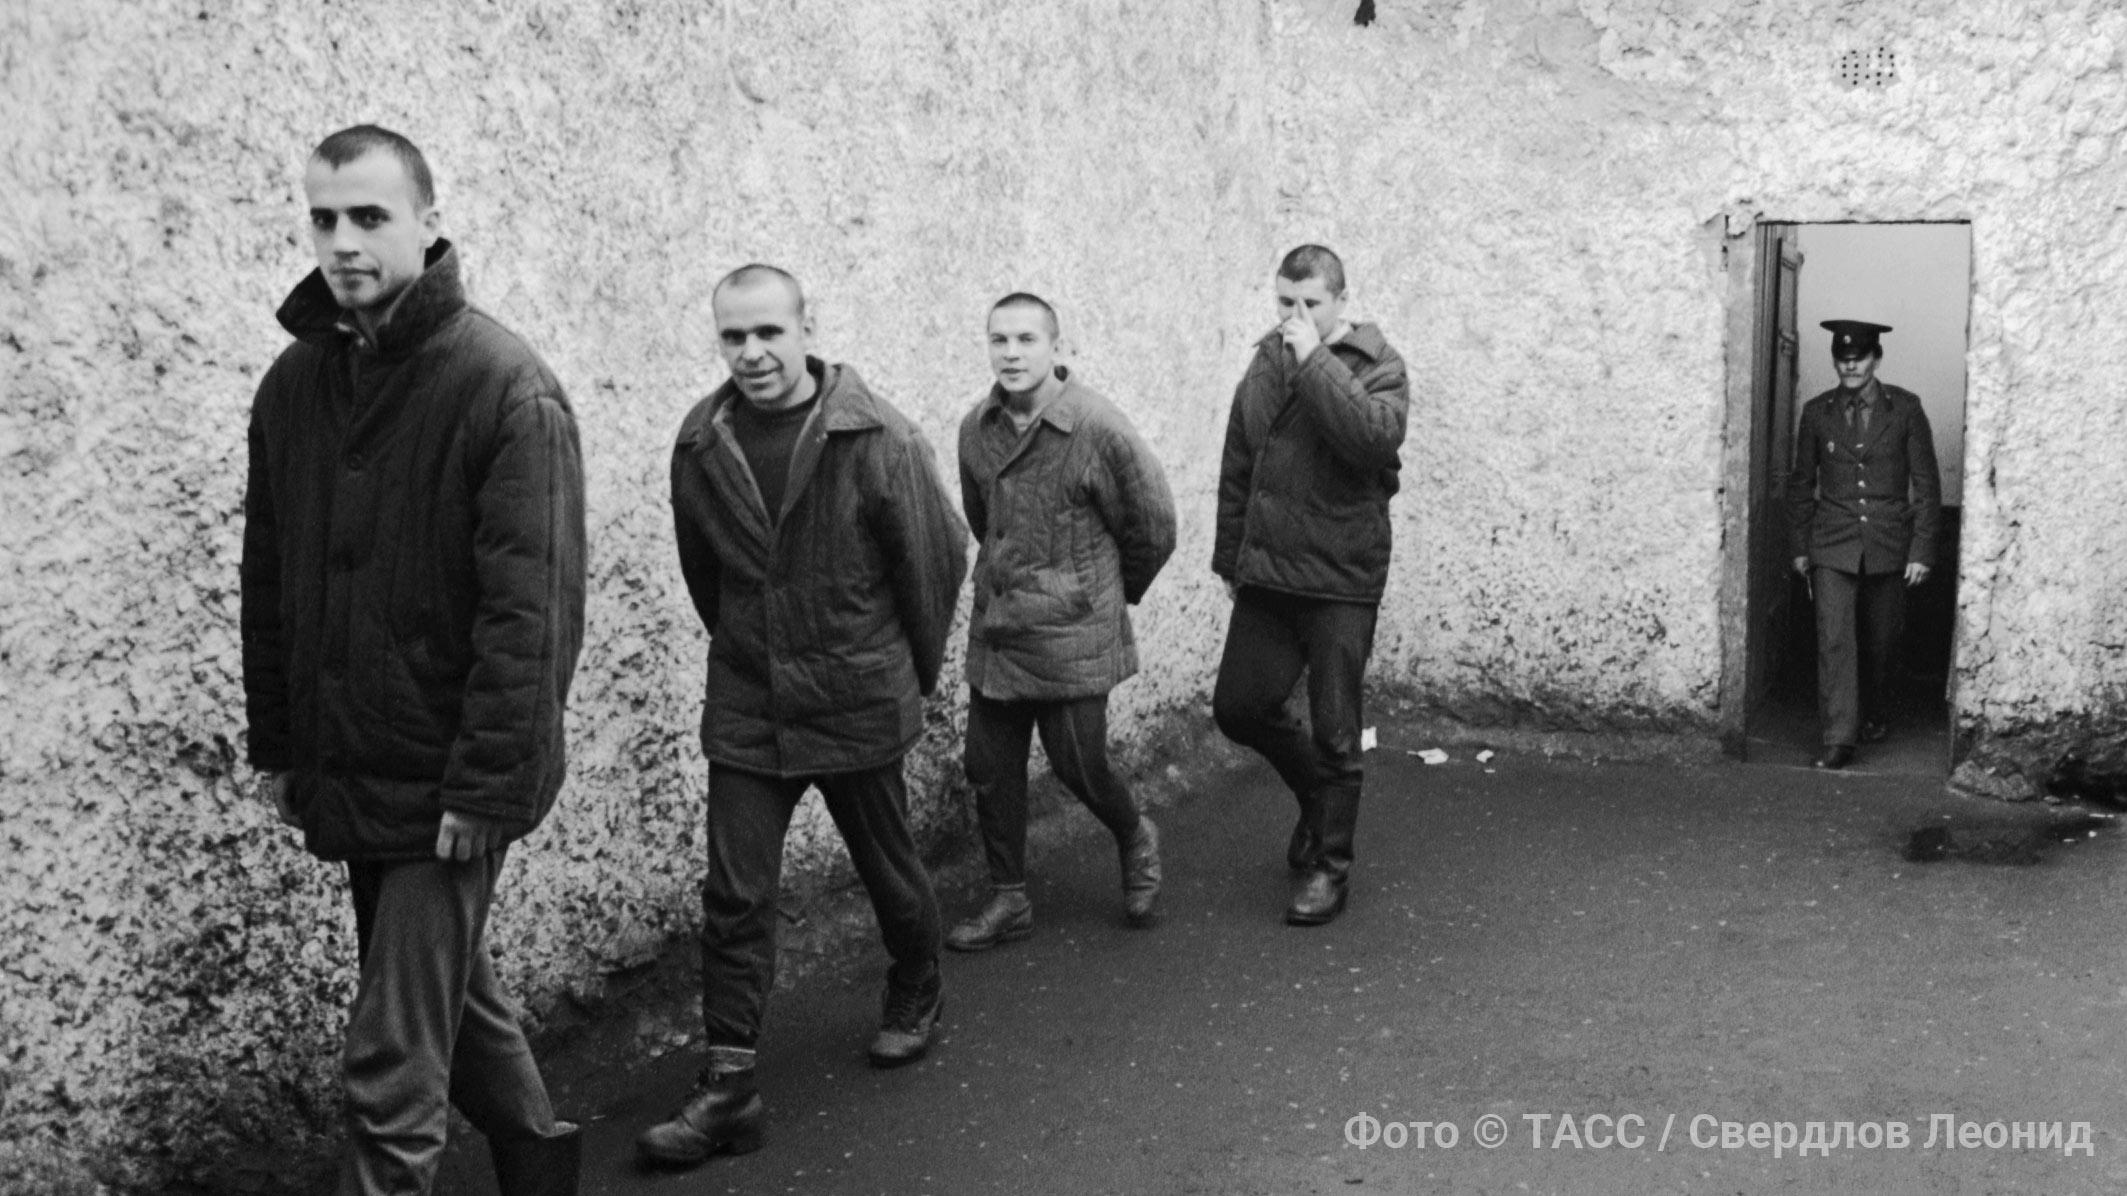 <p>Фото ©ТАСС / Свердлов Леонид</p>